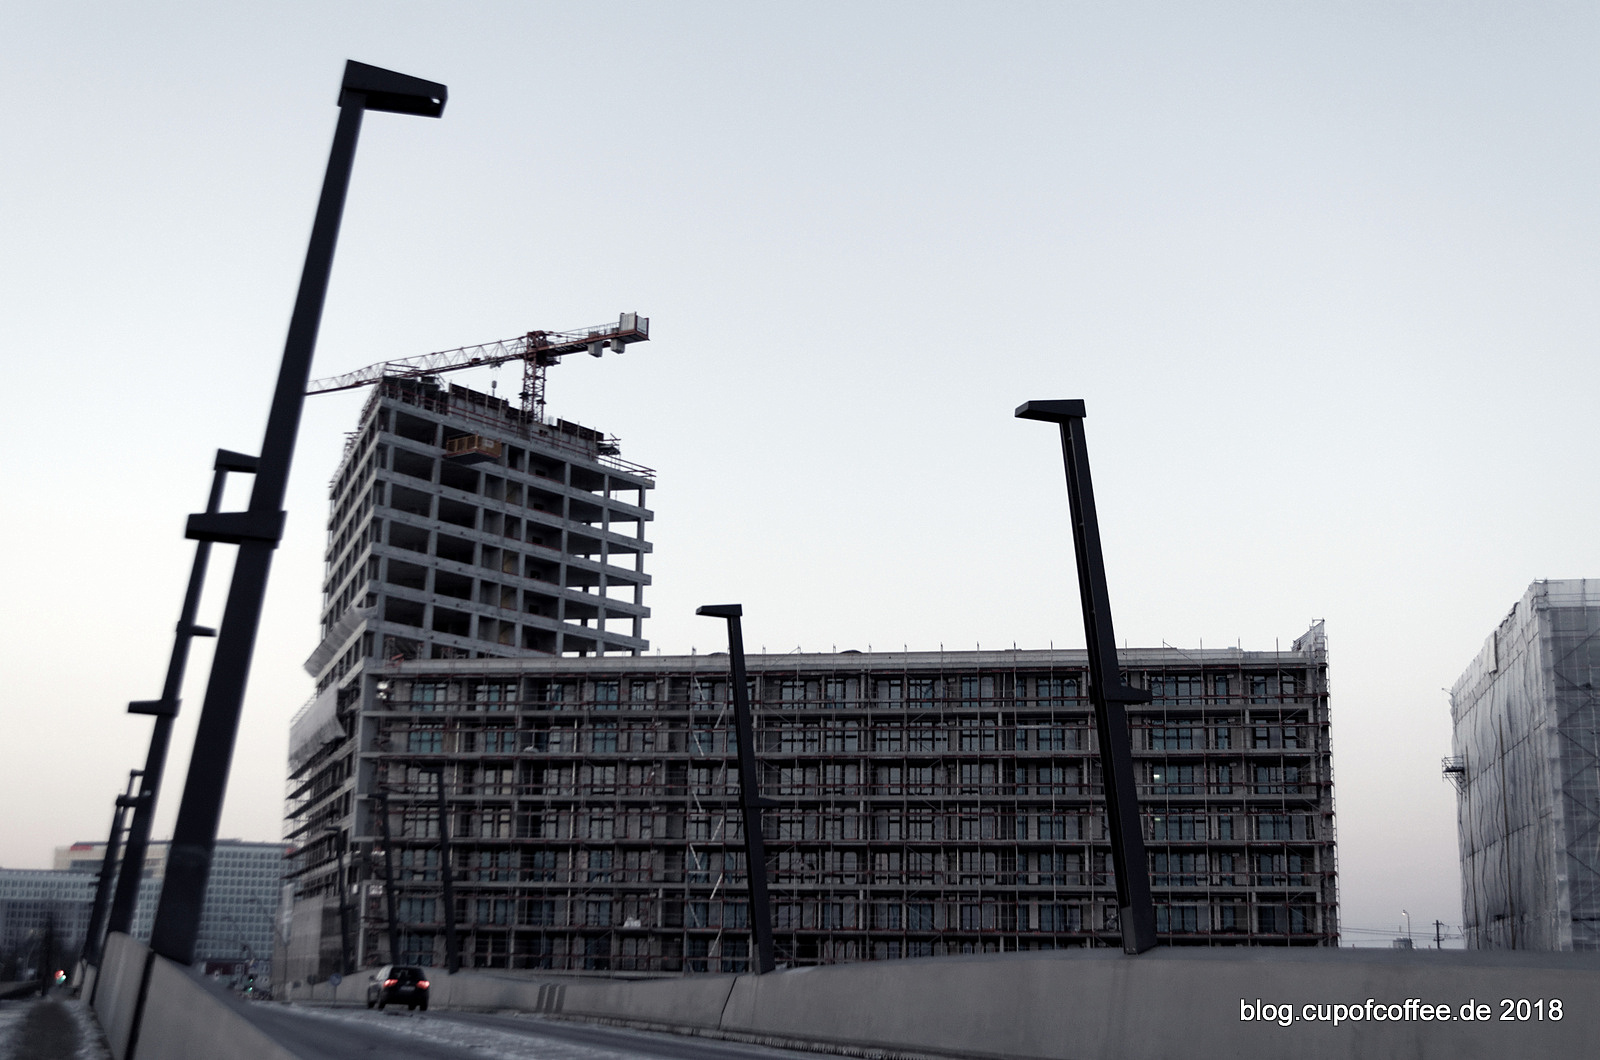 Hafencity / Campustower